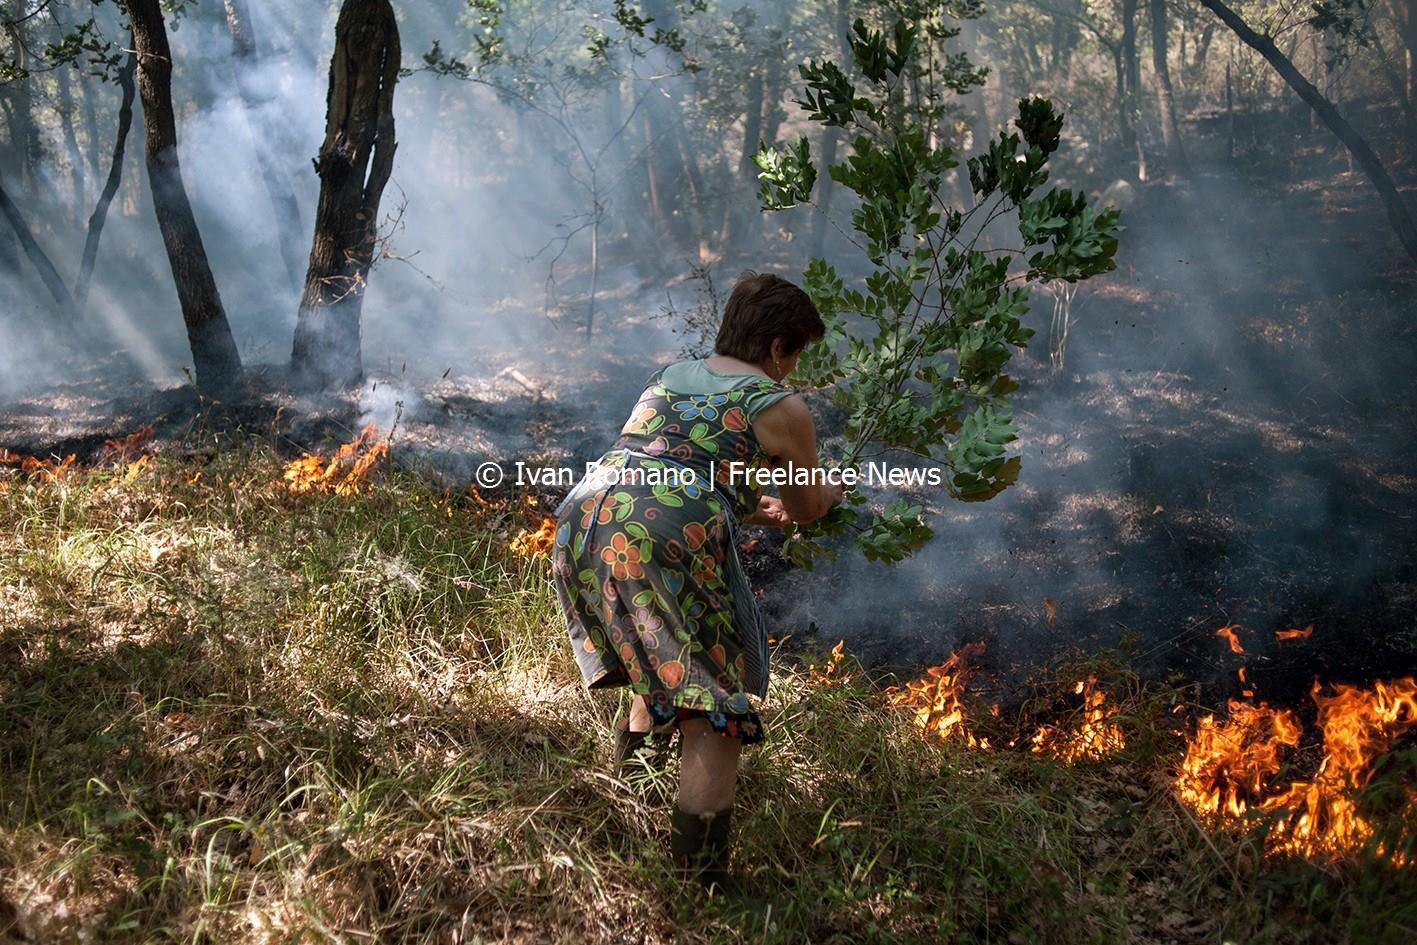 Scoppiati piu incendi a caserta e provincia situazione for Mobilifici caserta e provincia